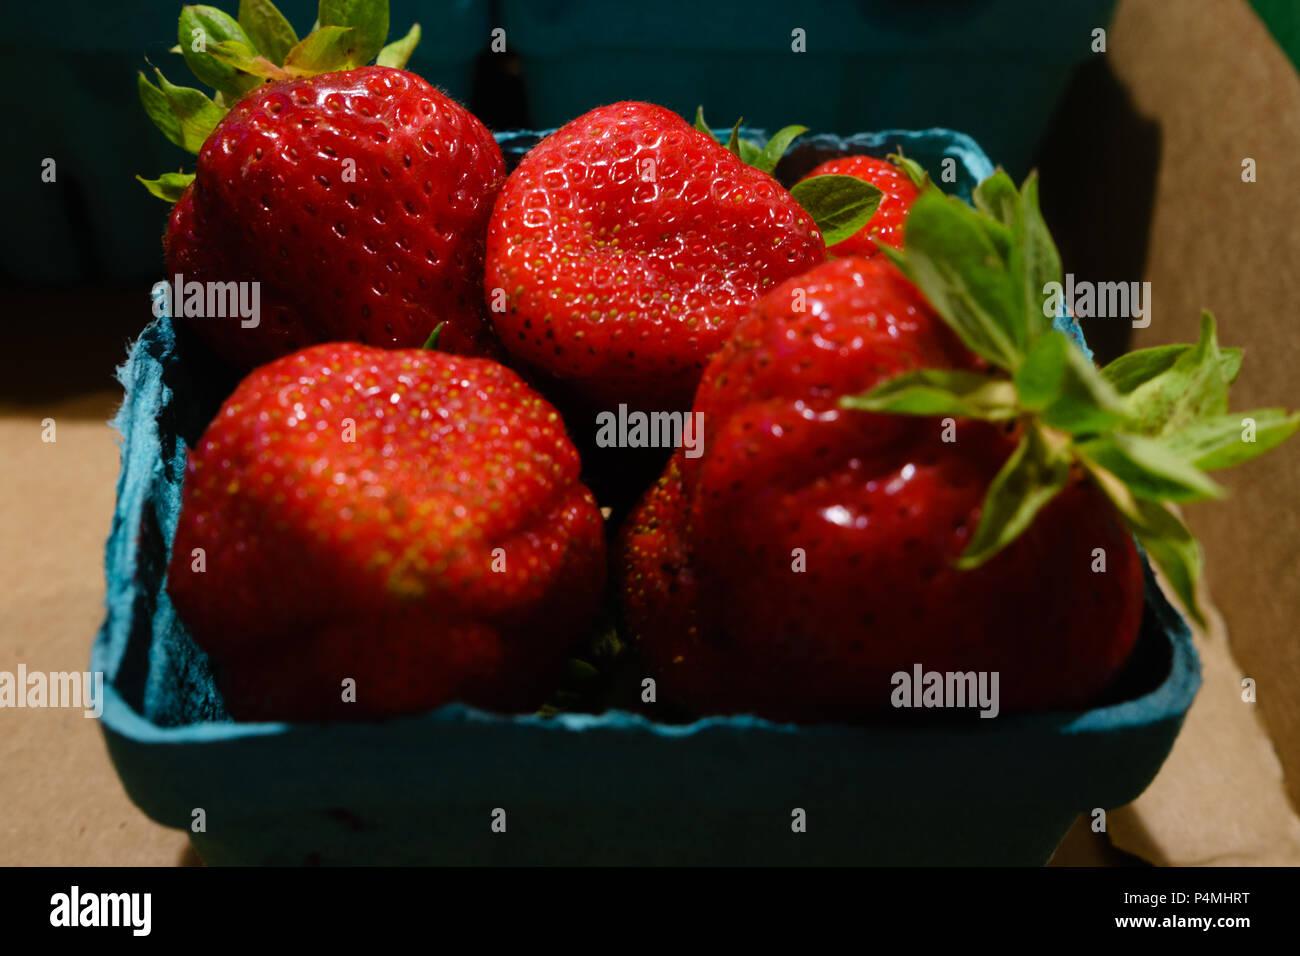 Picked strawberries - Stock Image